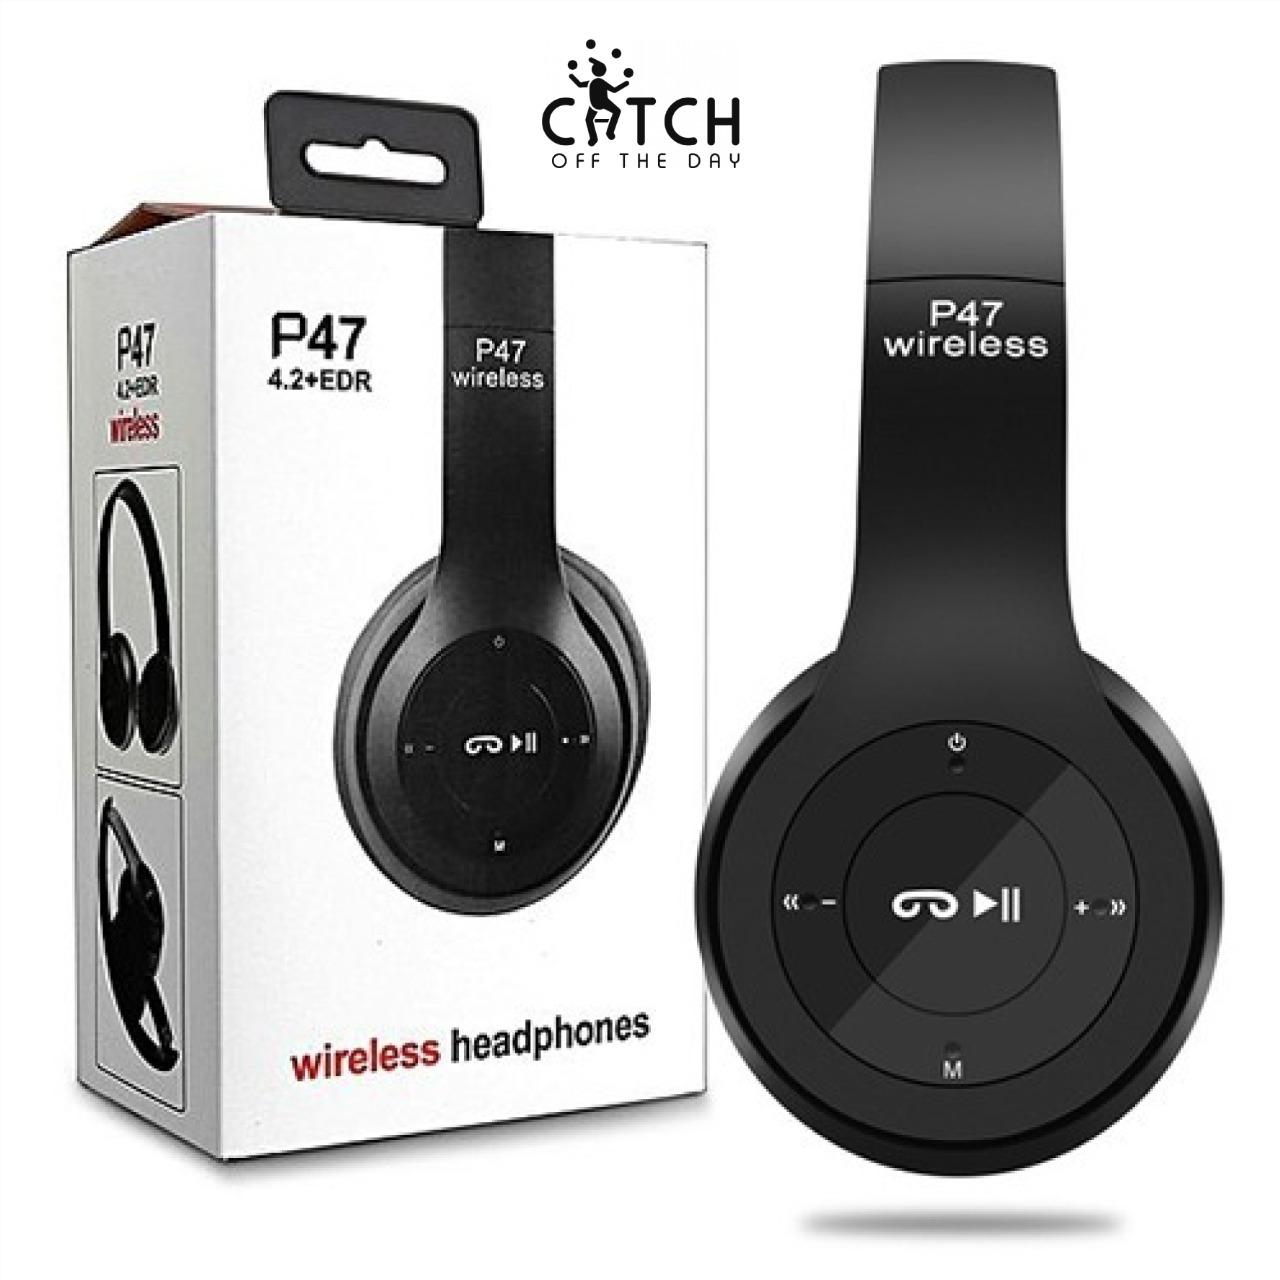 Wireless Headphones P47 Bluetooth Foldable Headset Wireless Headphones with Mic Stereo Headset Supports FM Radio / TF Card / AUX Cable